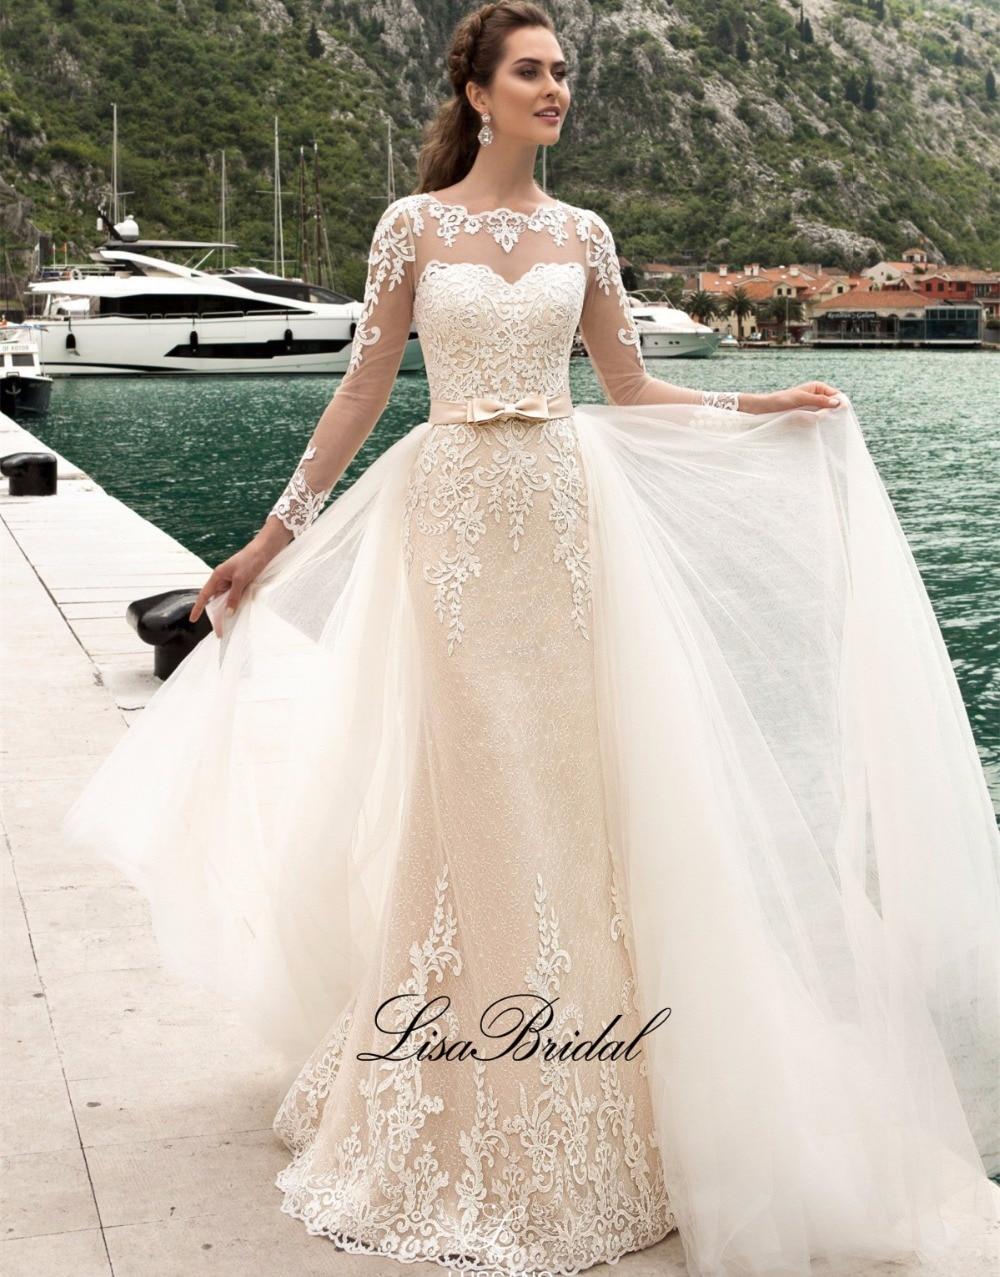 New style mermaid wedding dresses 2017 boat neck long for Boat neck long sleeve wedding dress